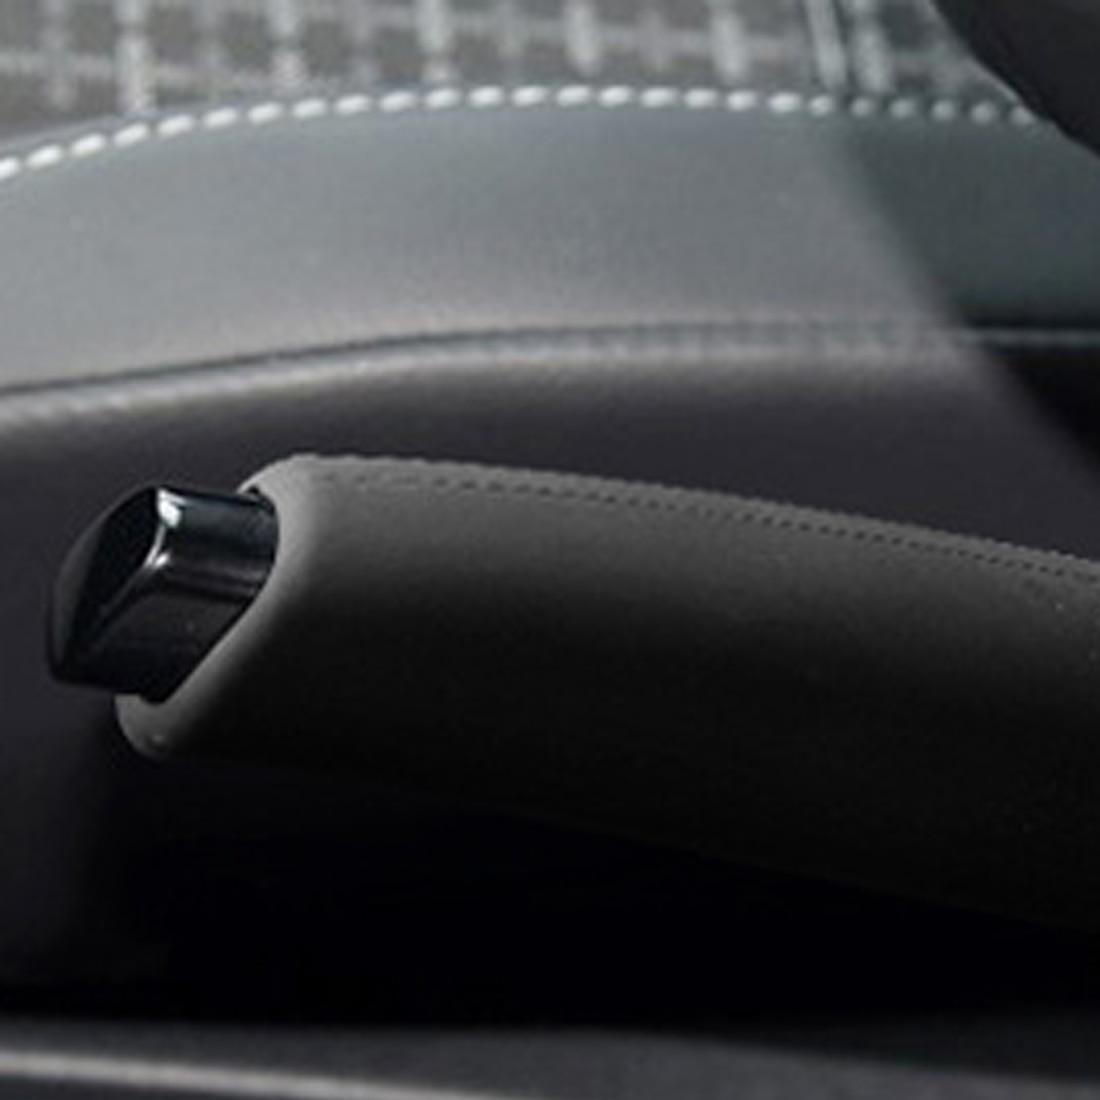 Dewtreetali New Arrival  Car Handbrake Covers Sleeve Silicone Gel Cover Anti-slip Parking Hand Brake Grips Sleeve Universal Deco